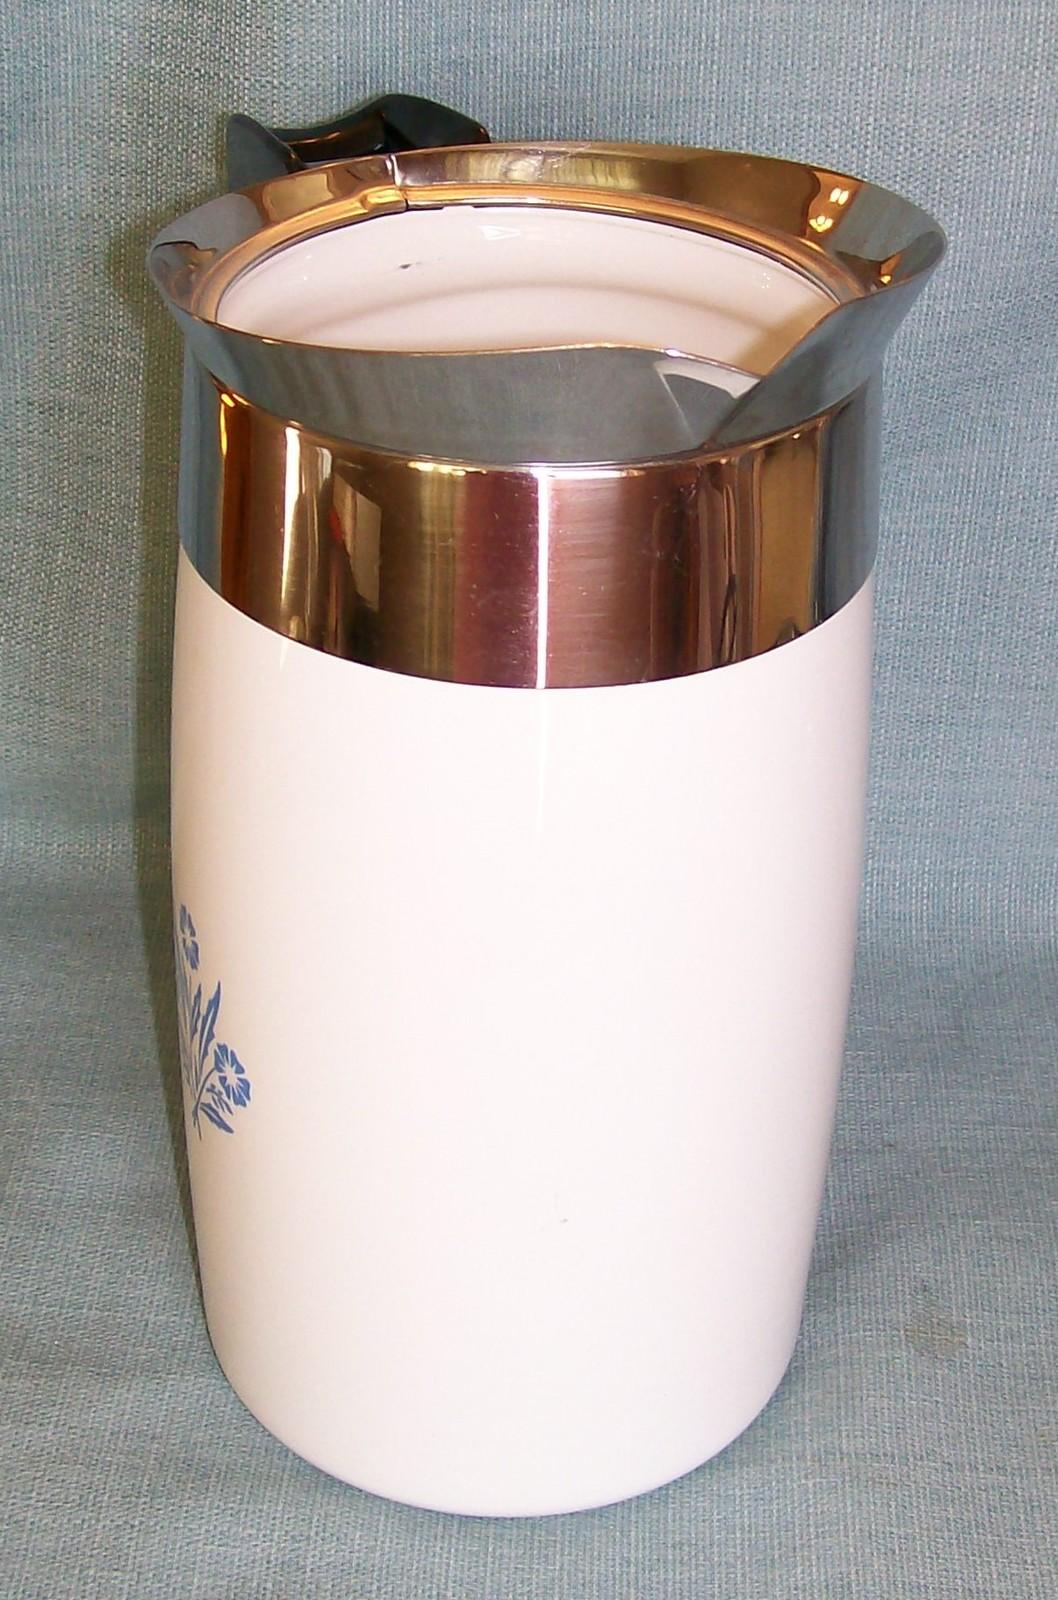 Corning Ware BLUE CORNFLOWER Electric Coffee Pot/Percolator 10 cup P-80-EP EUVC image 5